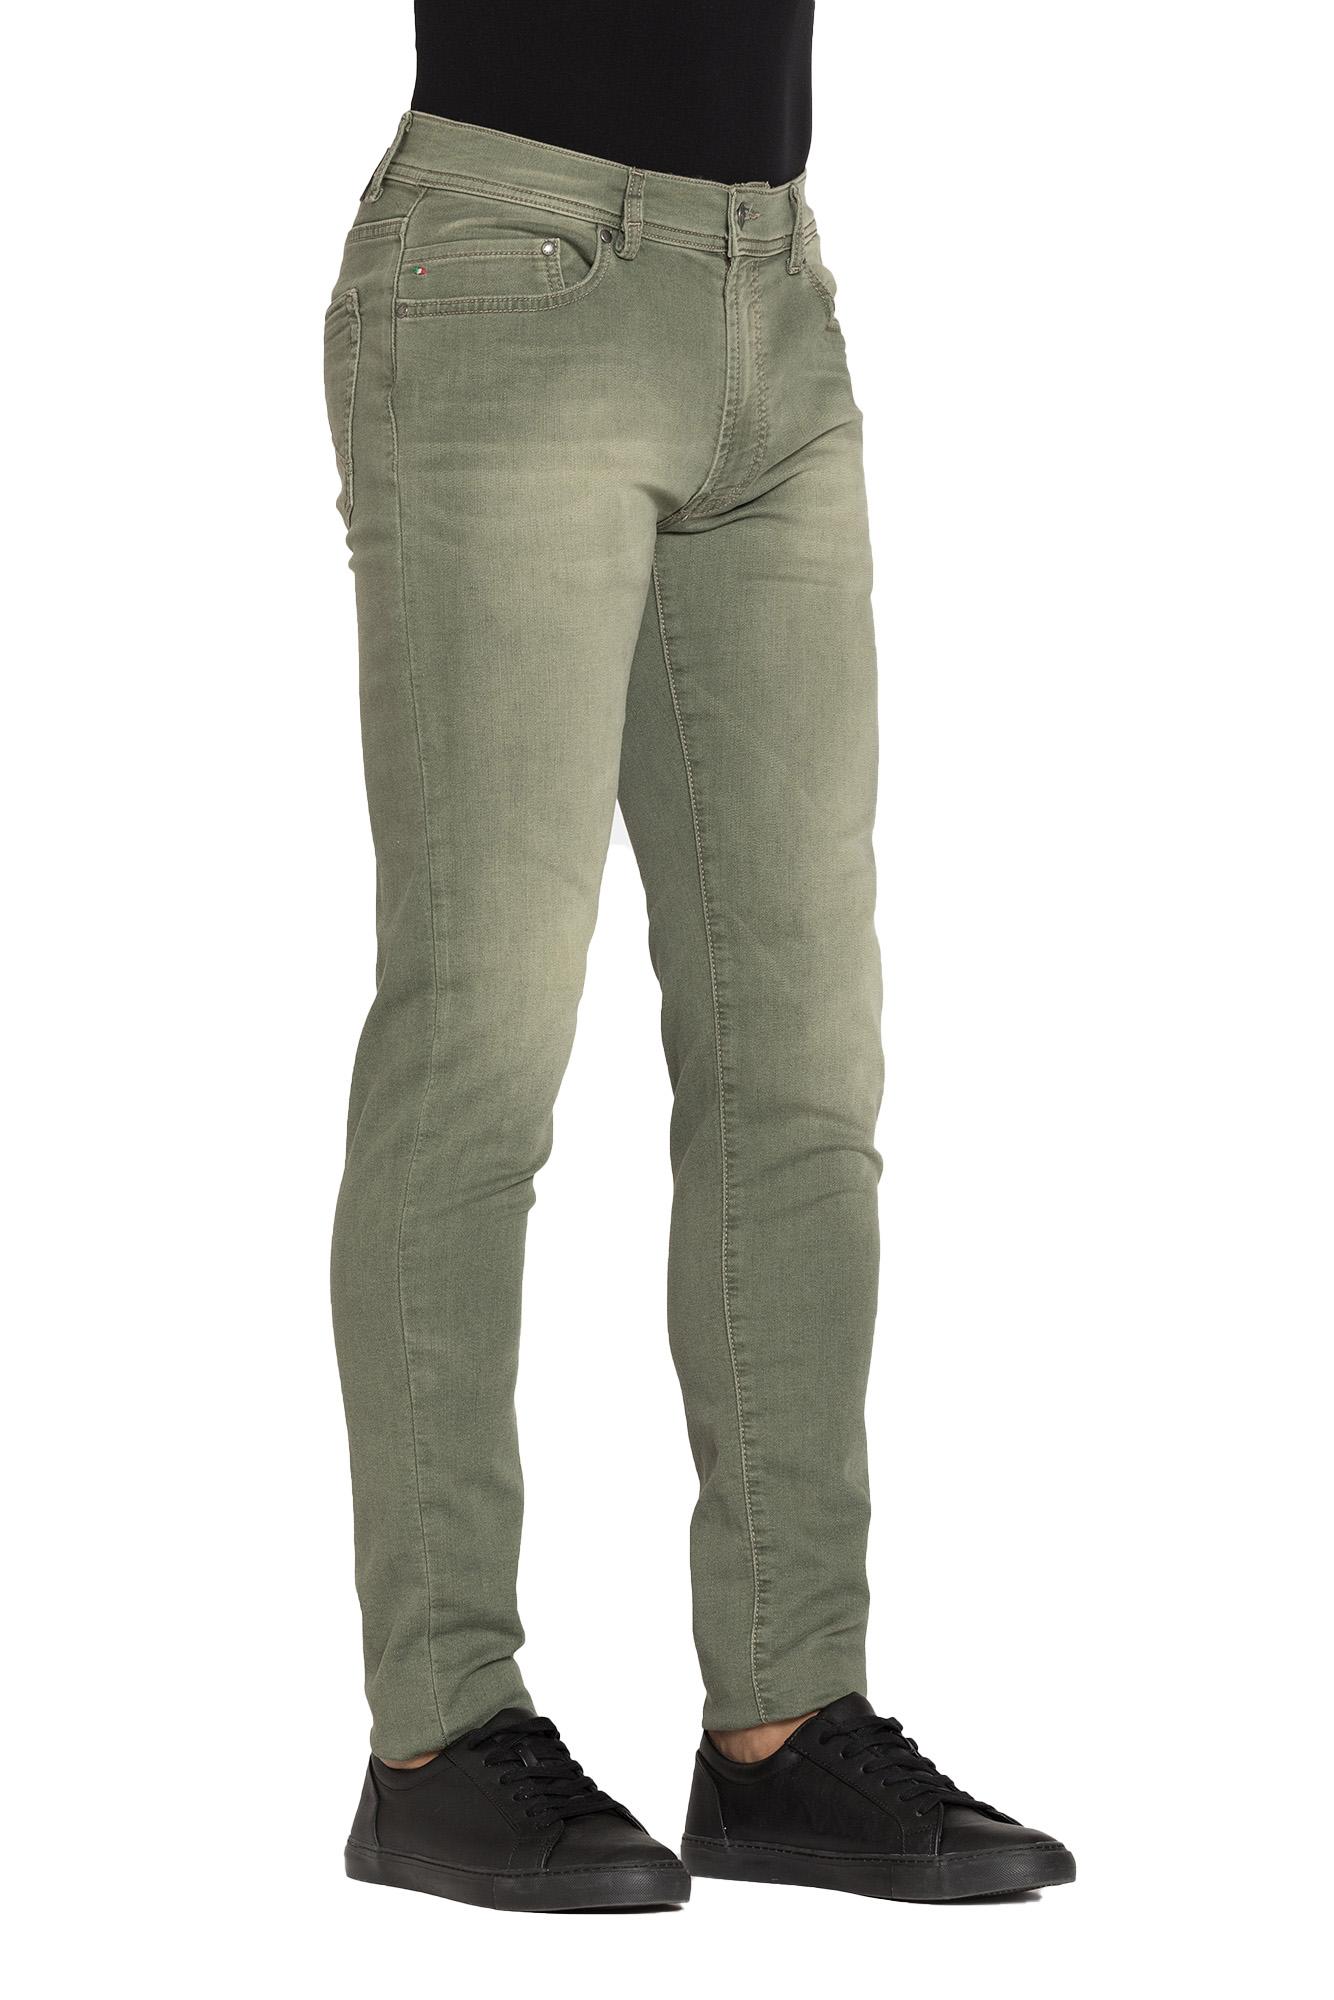 Carrera-Jeans-Jeans-per-uomo-tinta-unita miniatura 12